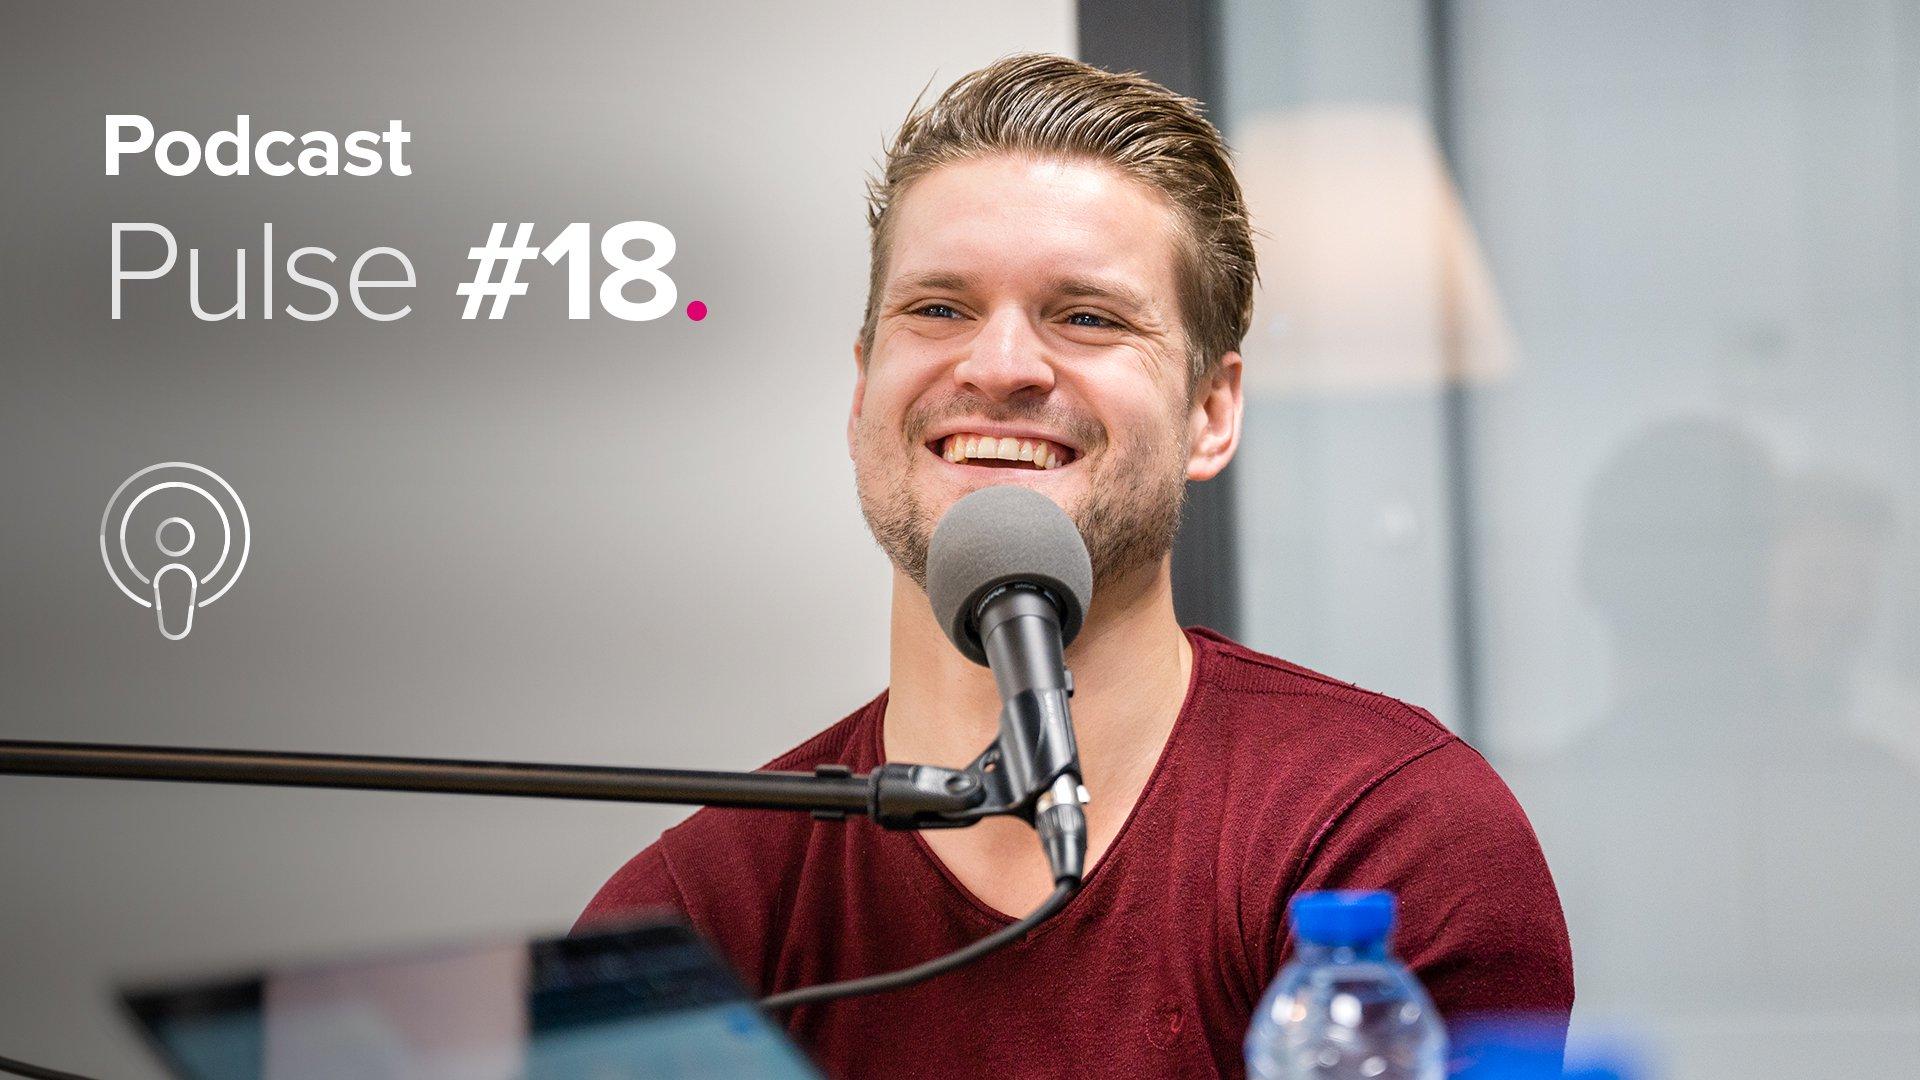 Podcast Digital Brains Pulse #18